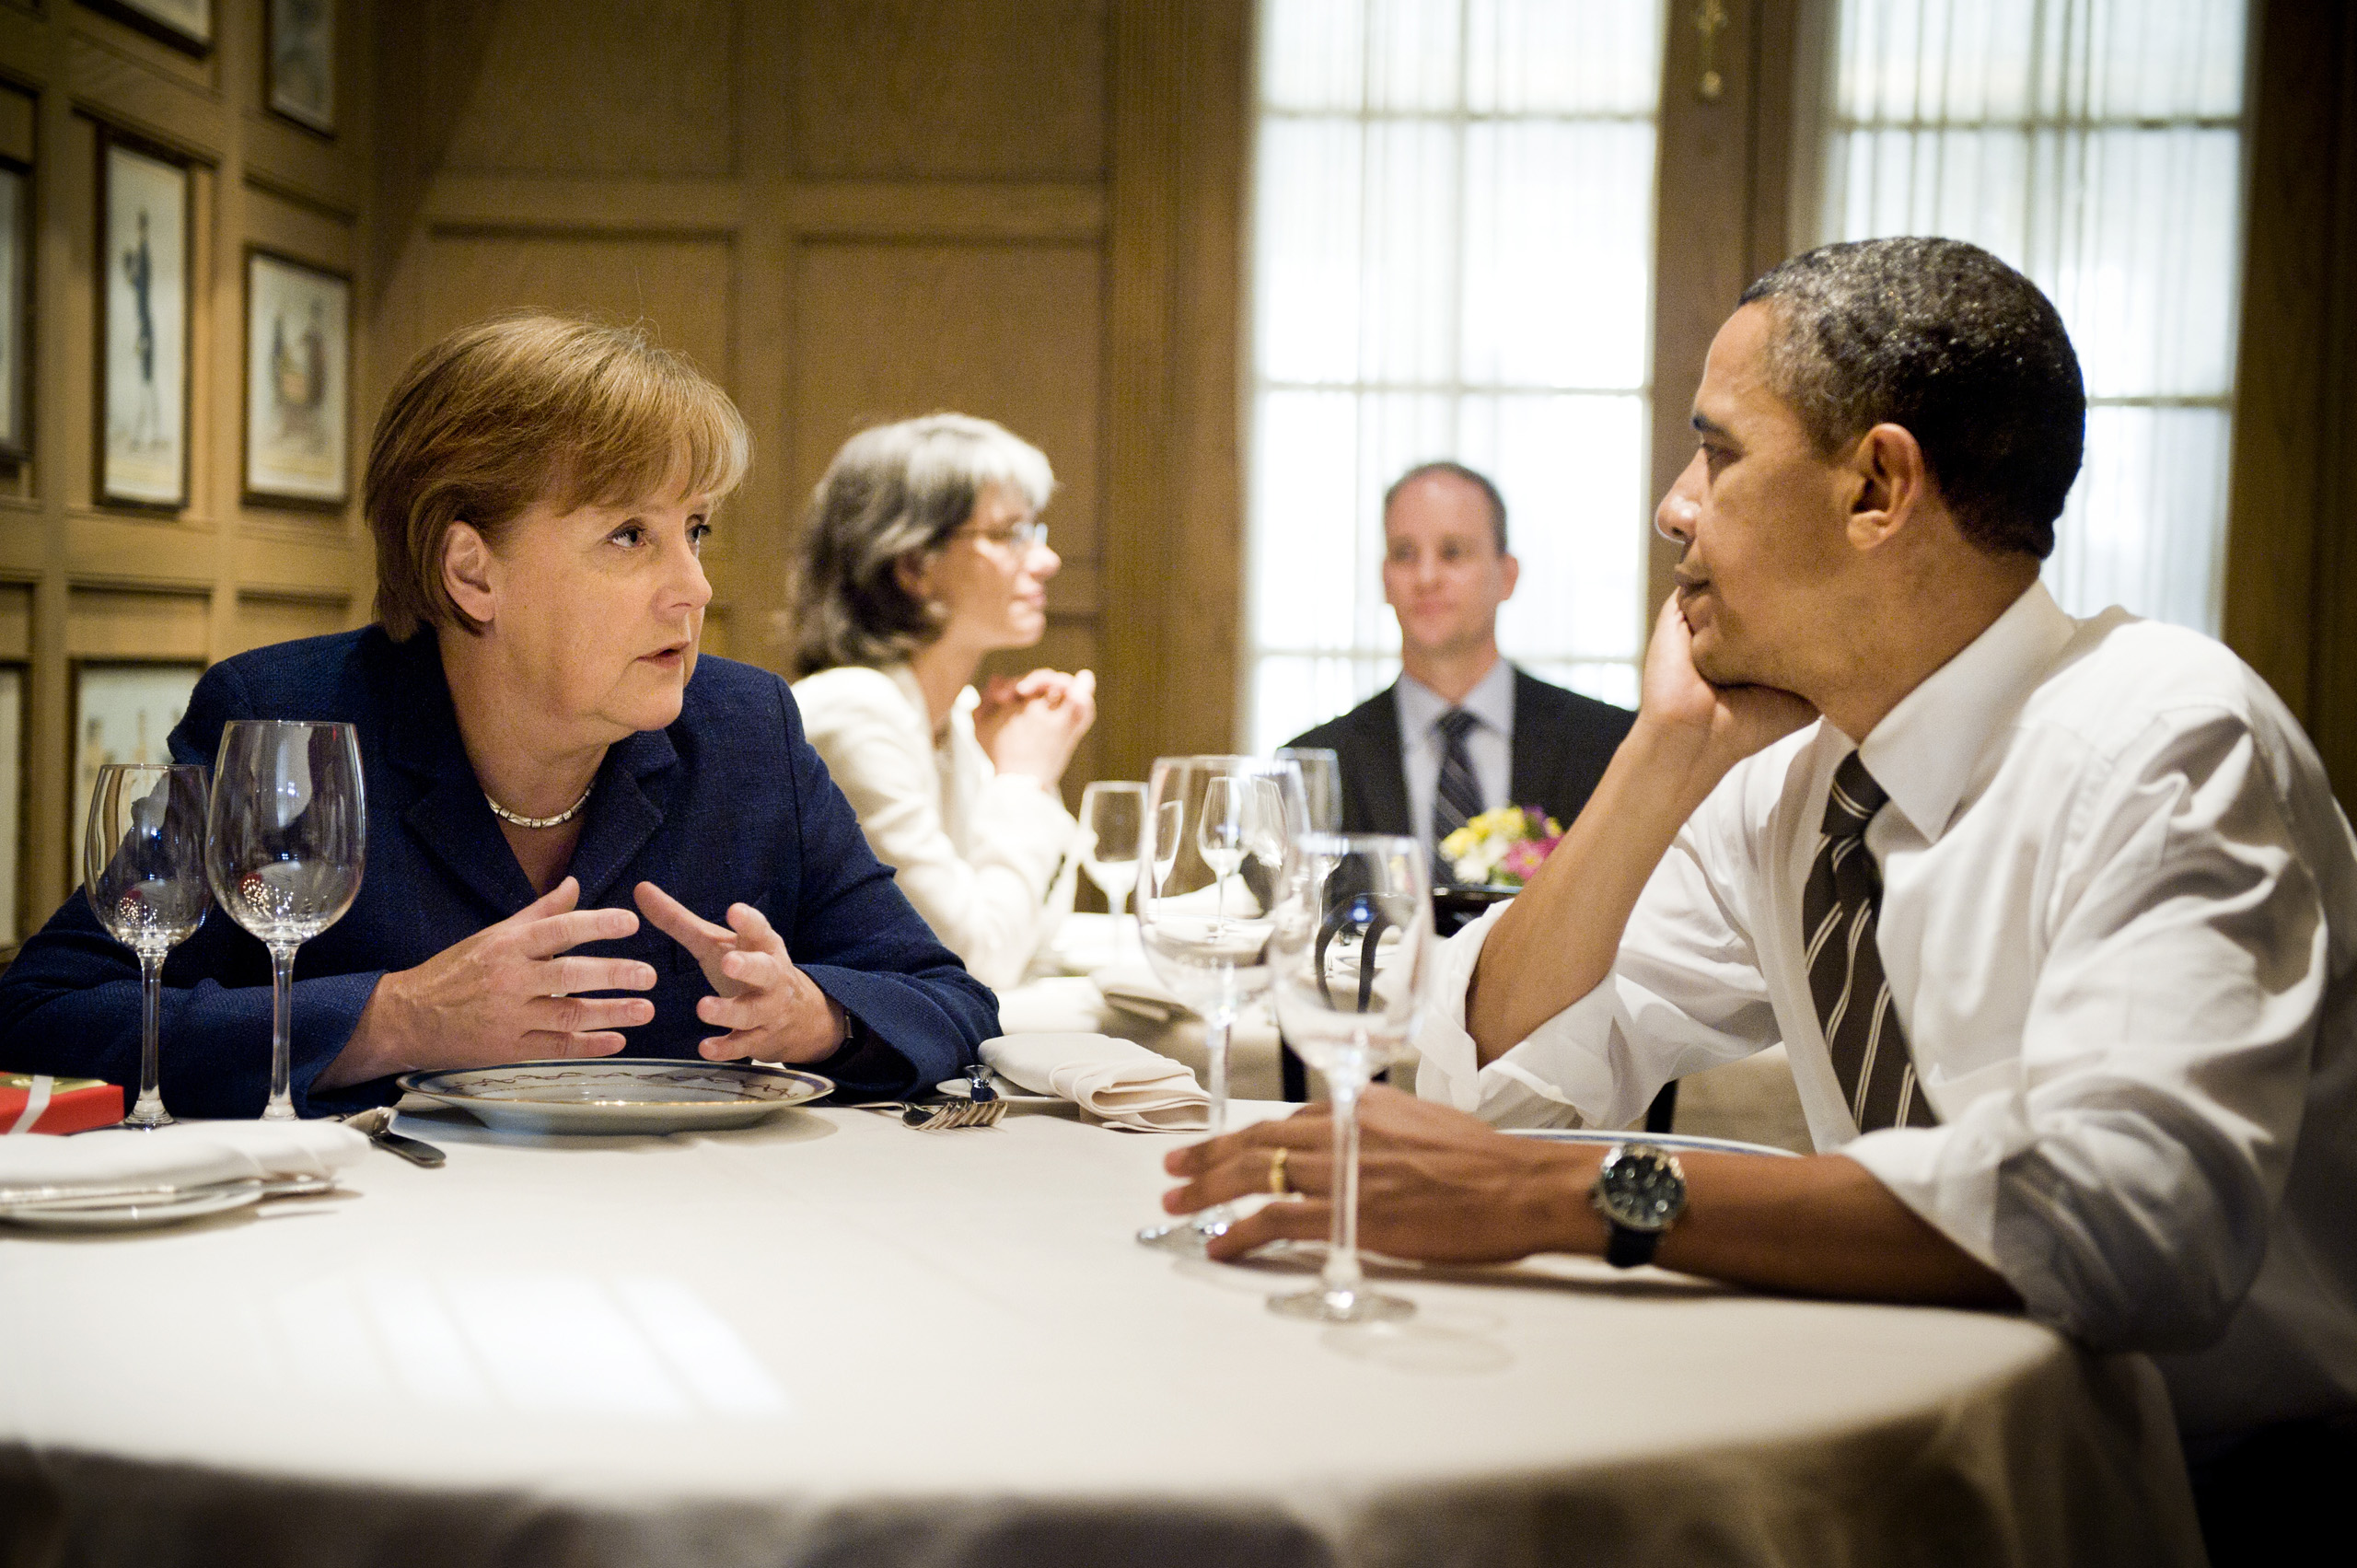 Chancellor Merkel and President Obama talk in a restaurant in Washington D.C. June 7, 2011.